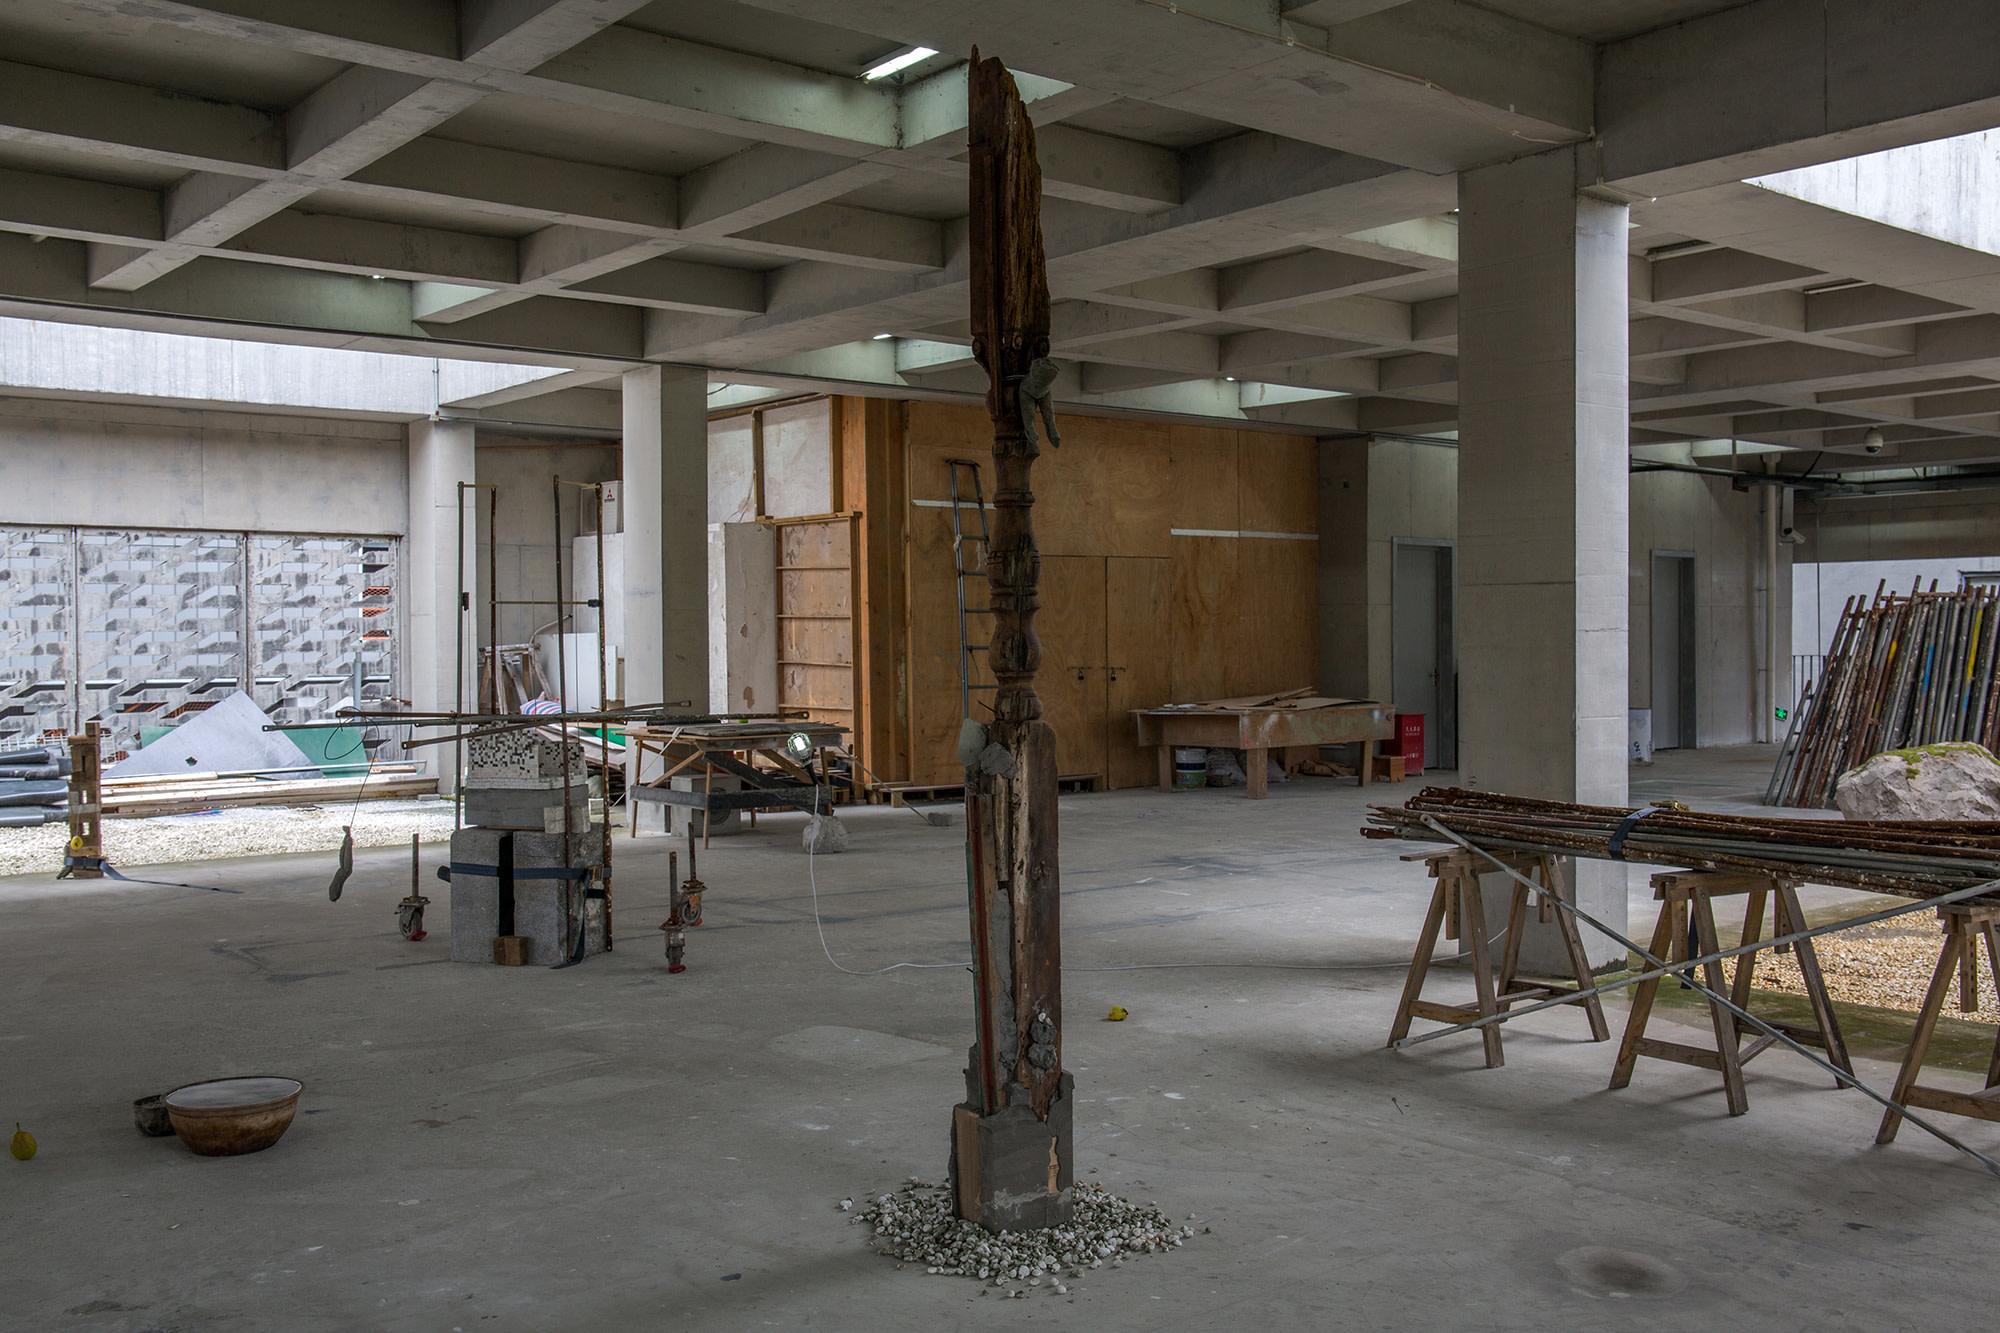 "<div class=""artwork_caption""><p>Installation view, Yu Ji, Green Hair Monster, commission for 11th Shanghai Biennale, Power Station Art Museum, Shanghai, 12 Nov 2016 - 12 March 2017</p></div>"